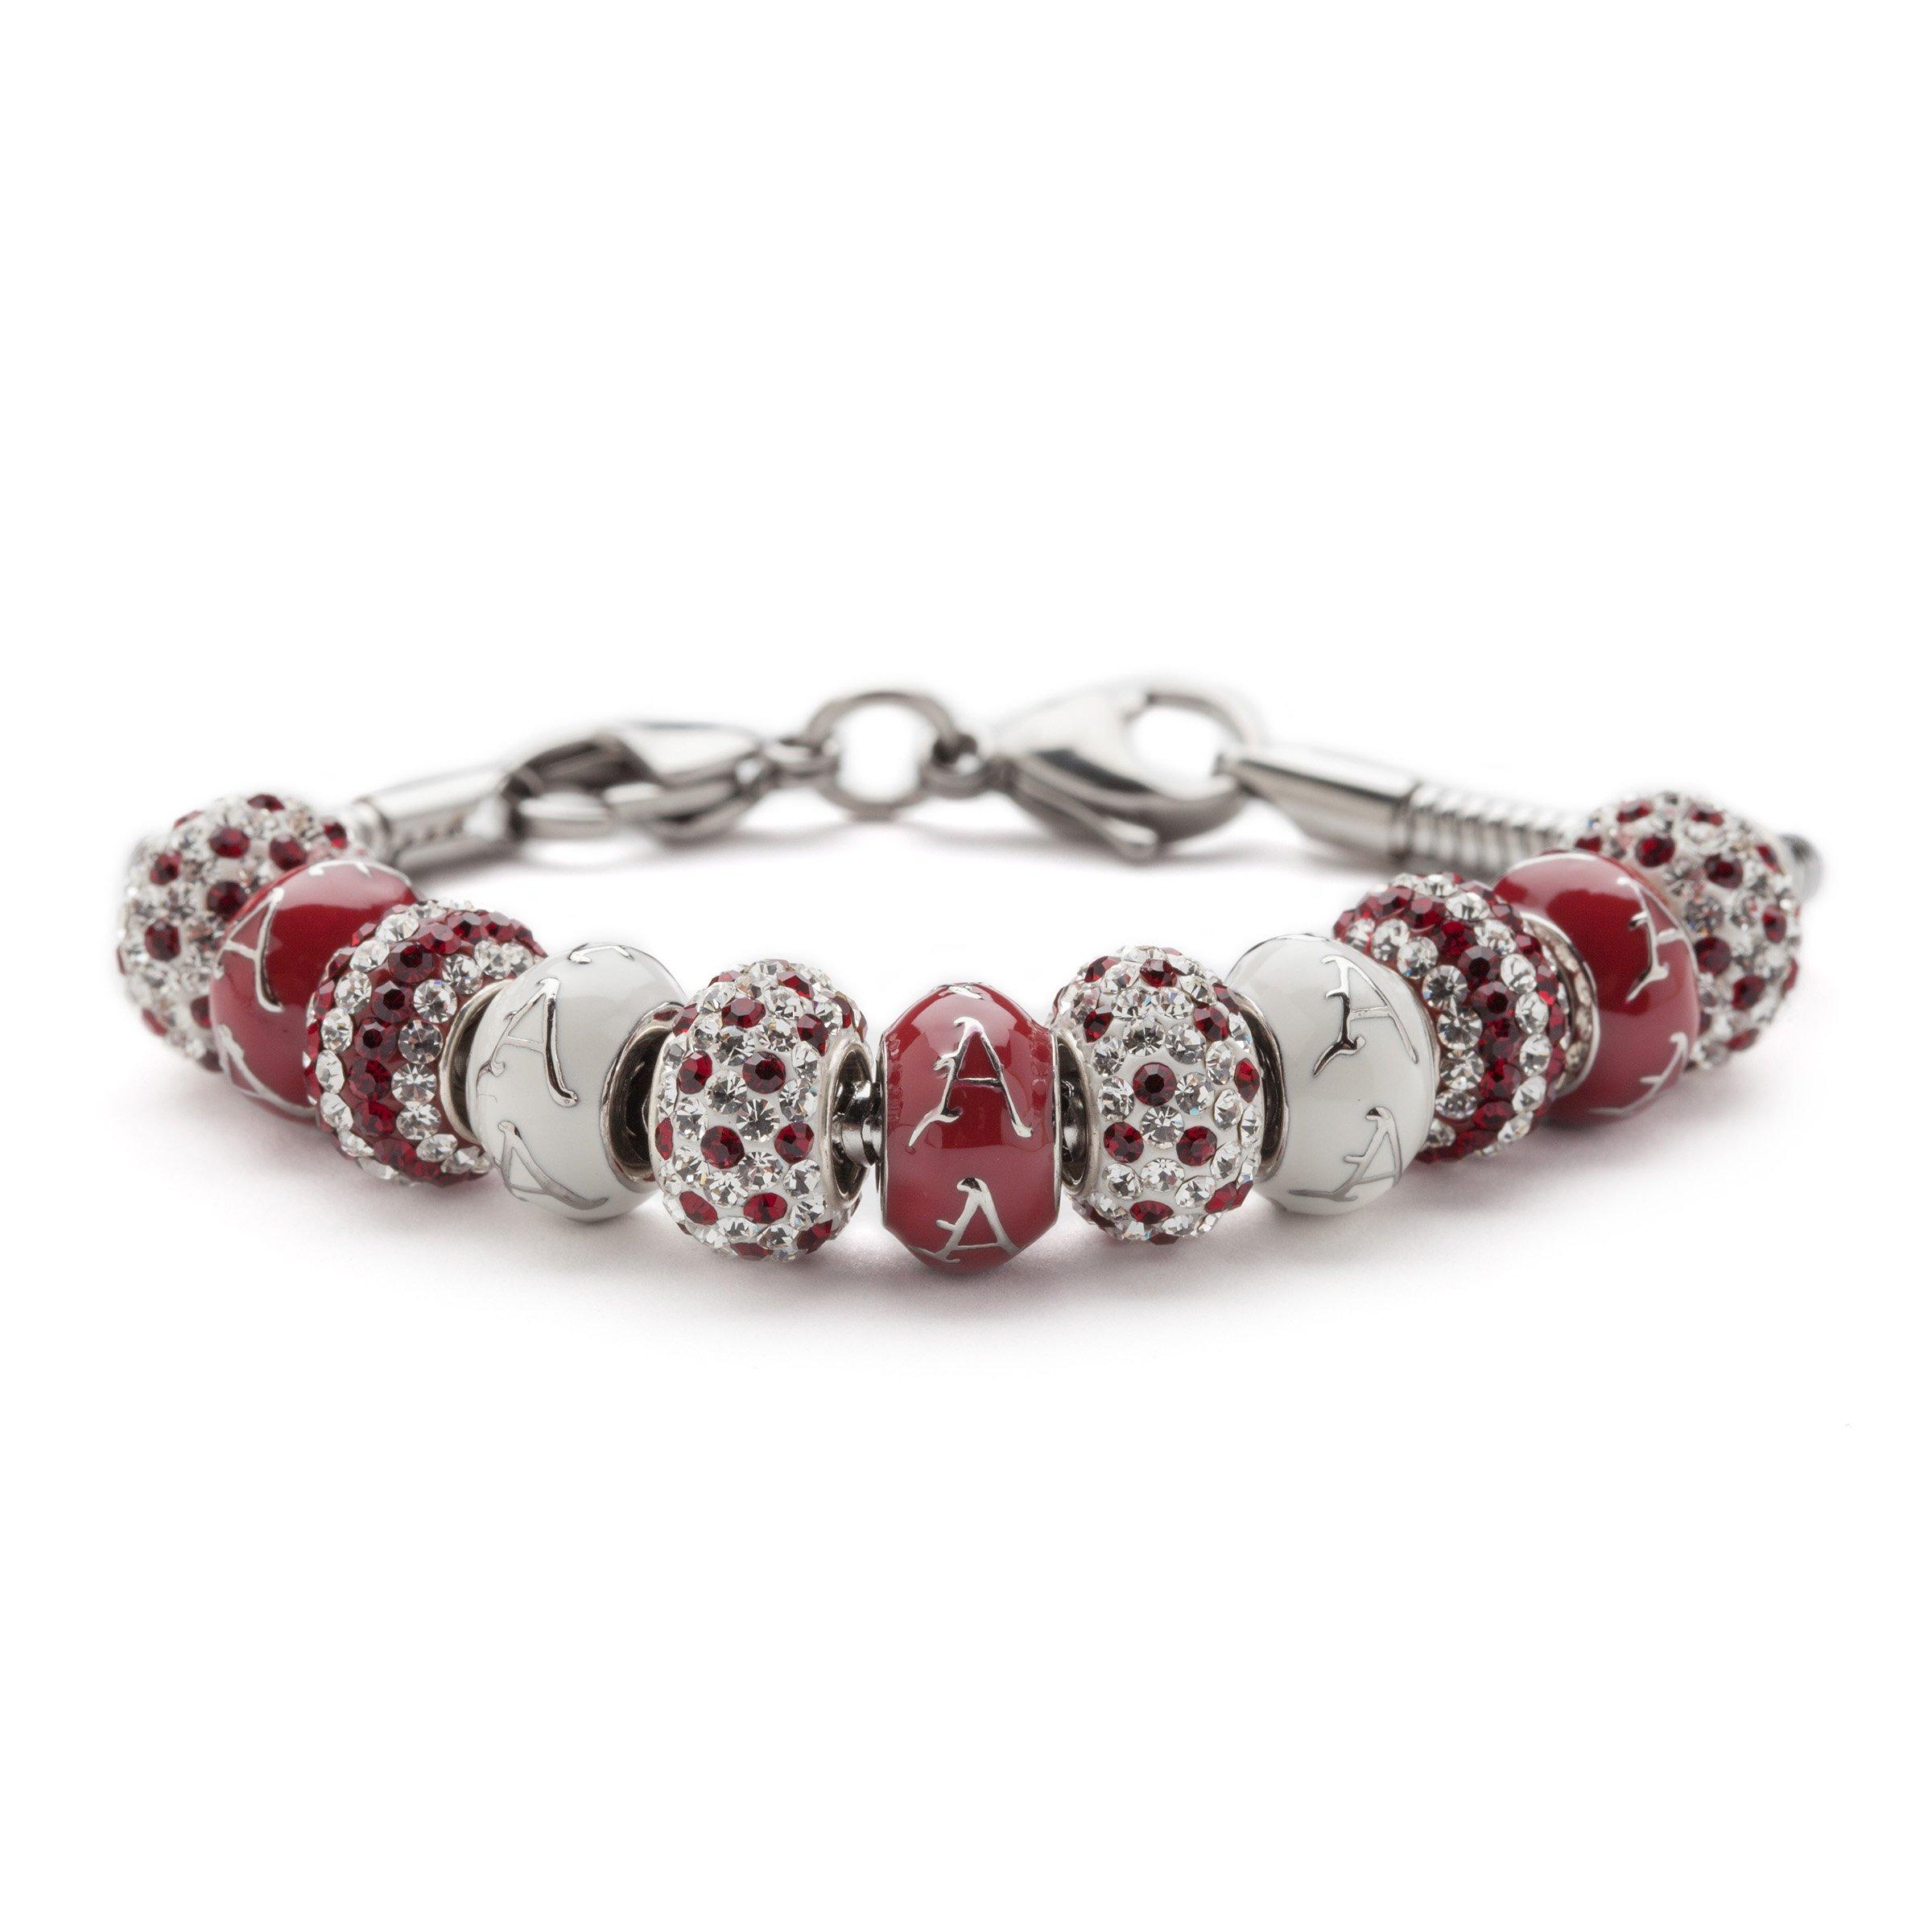 University of Arkansas Bracelet | UA Razorbacks - Bracelet with 5 UA Beads and 6 Crystal Charms | Officially Licensed University of Arkansas Jewelry | UA Gifts | UARK Logo | Stainless Steel